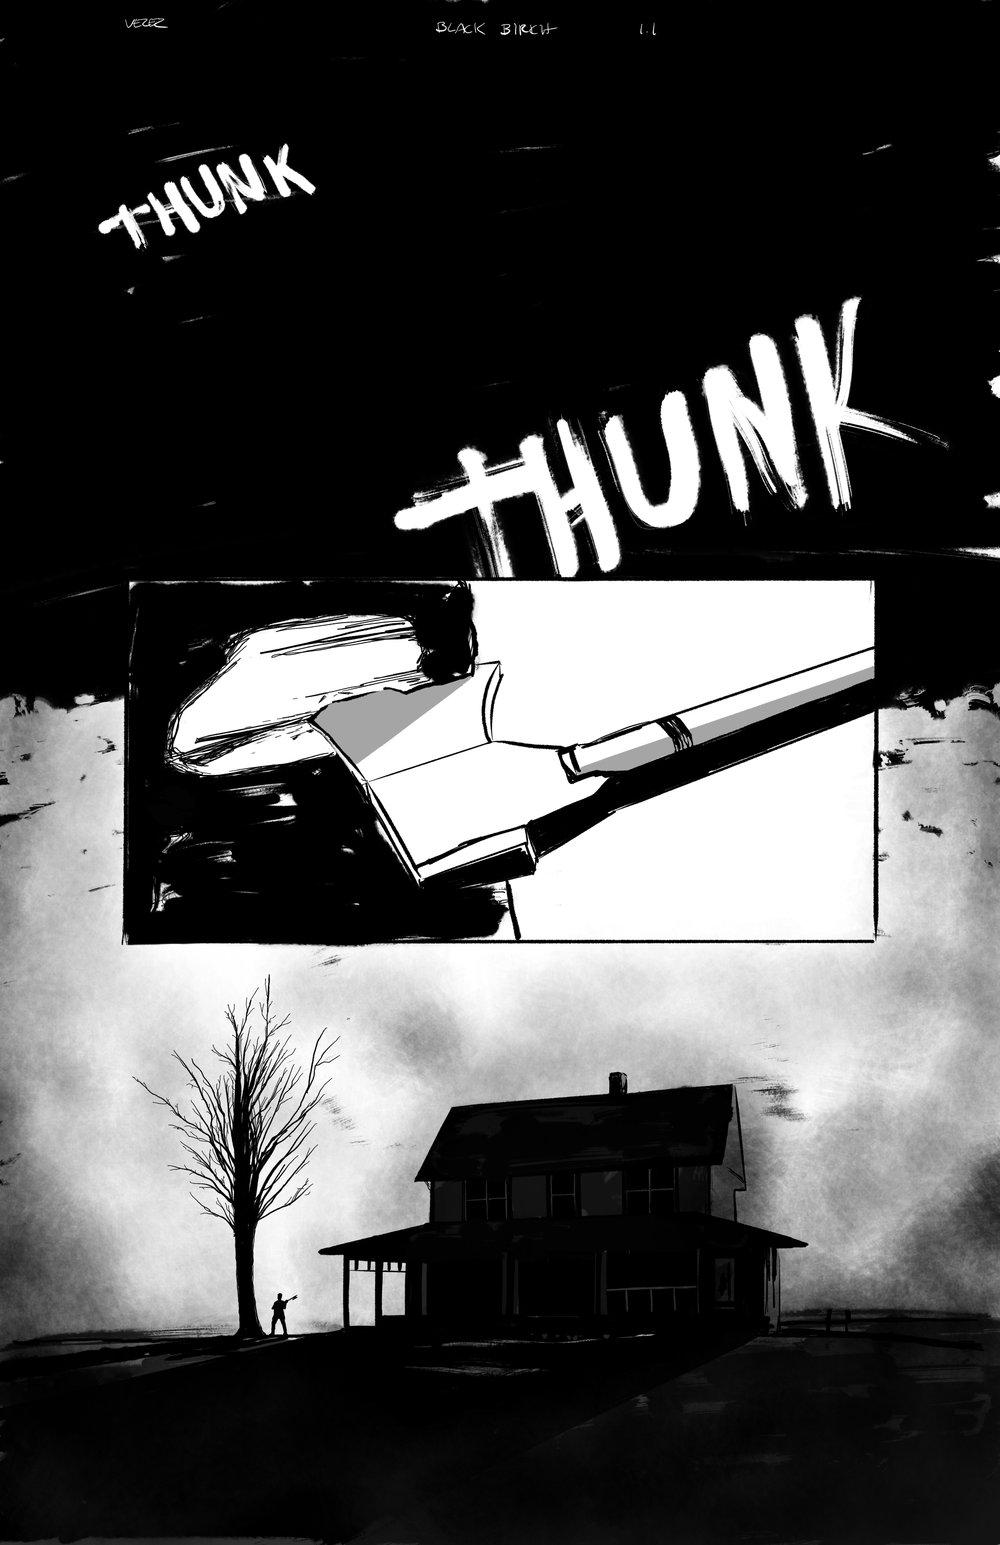 Black Birch // Issue 1 Page 1 - Inks